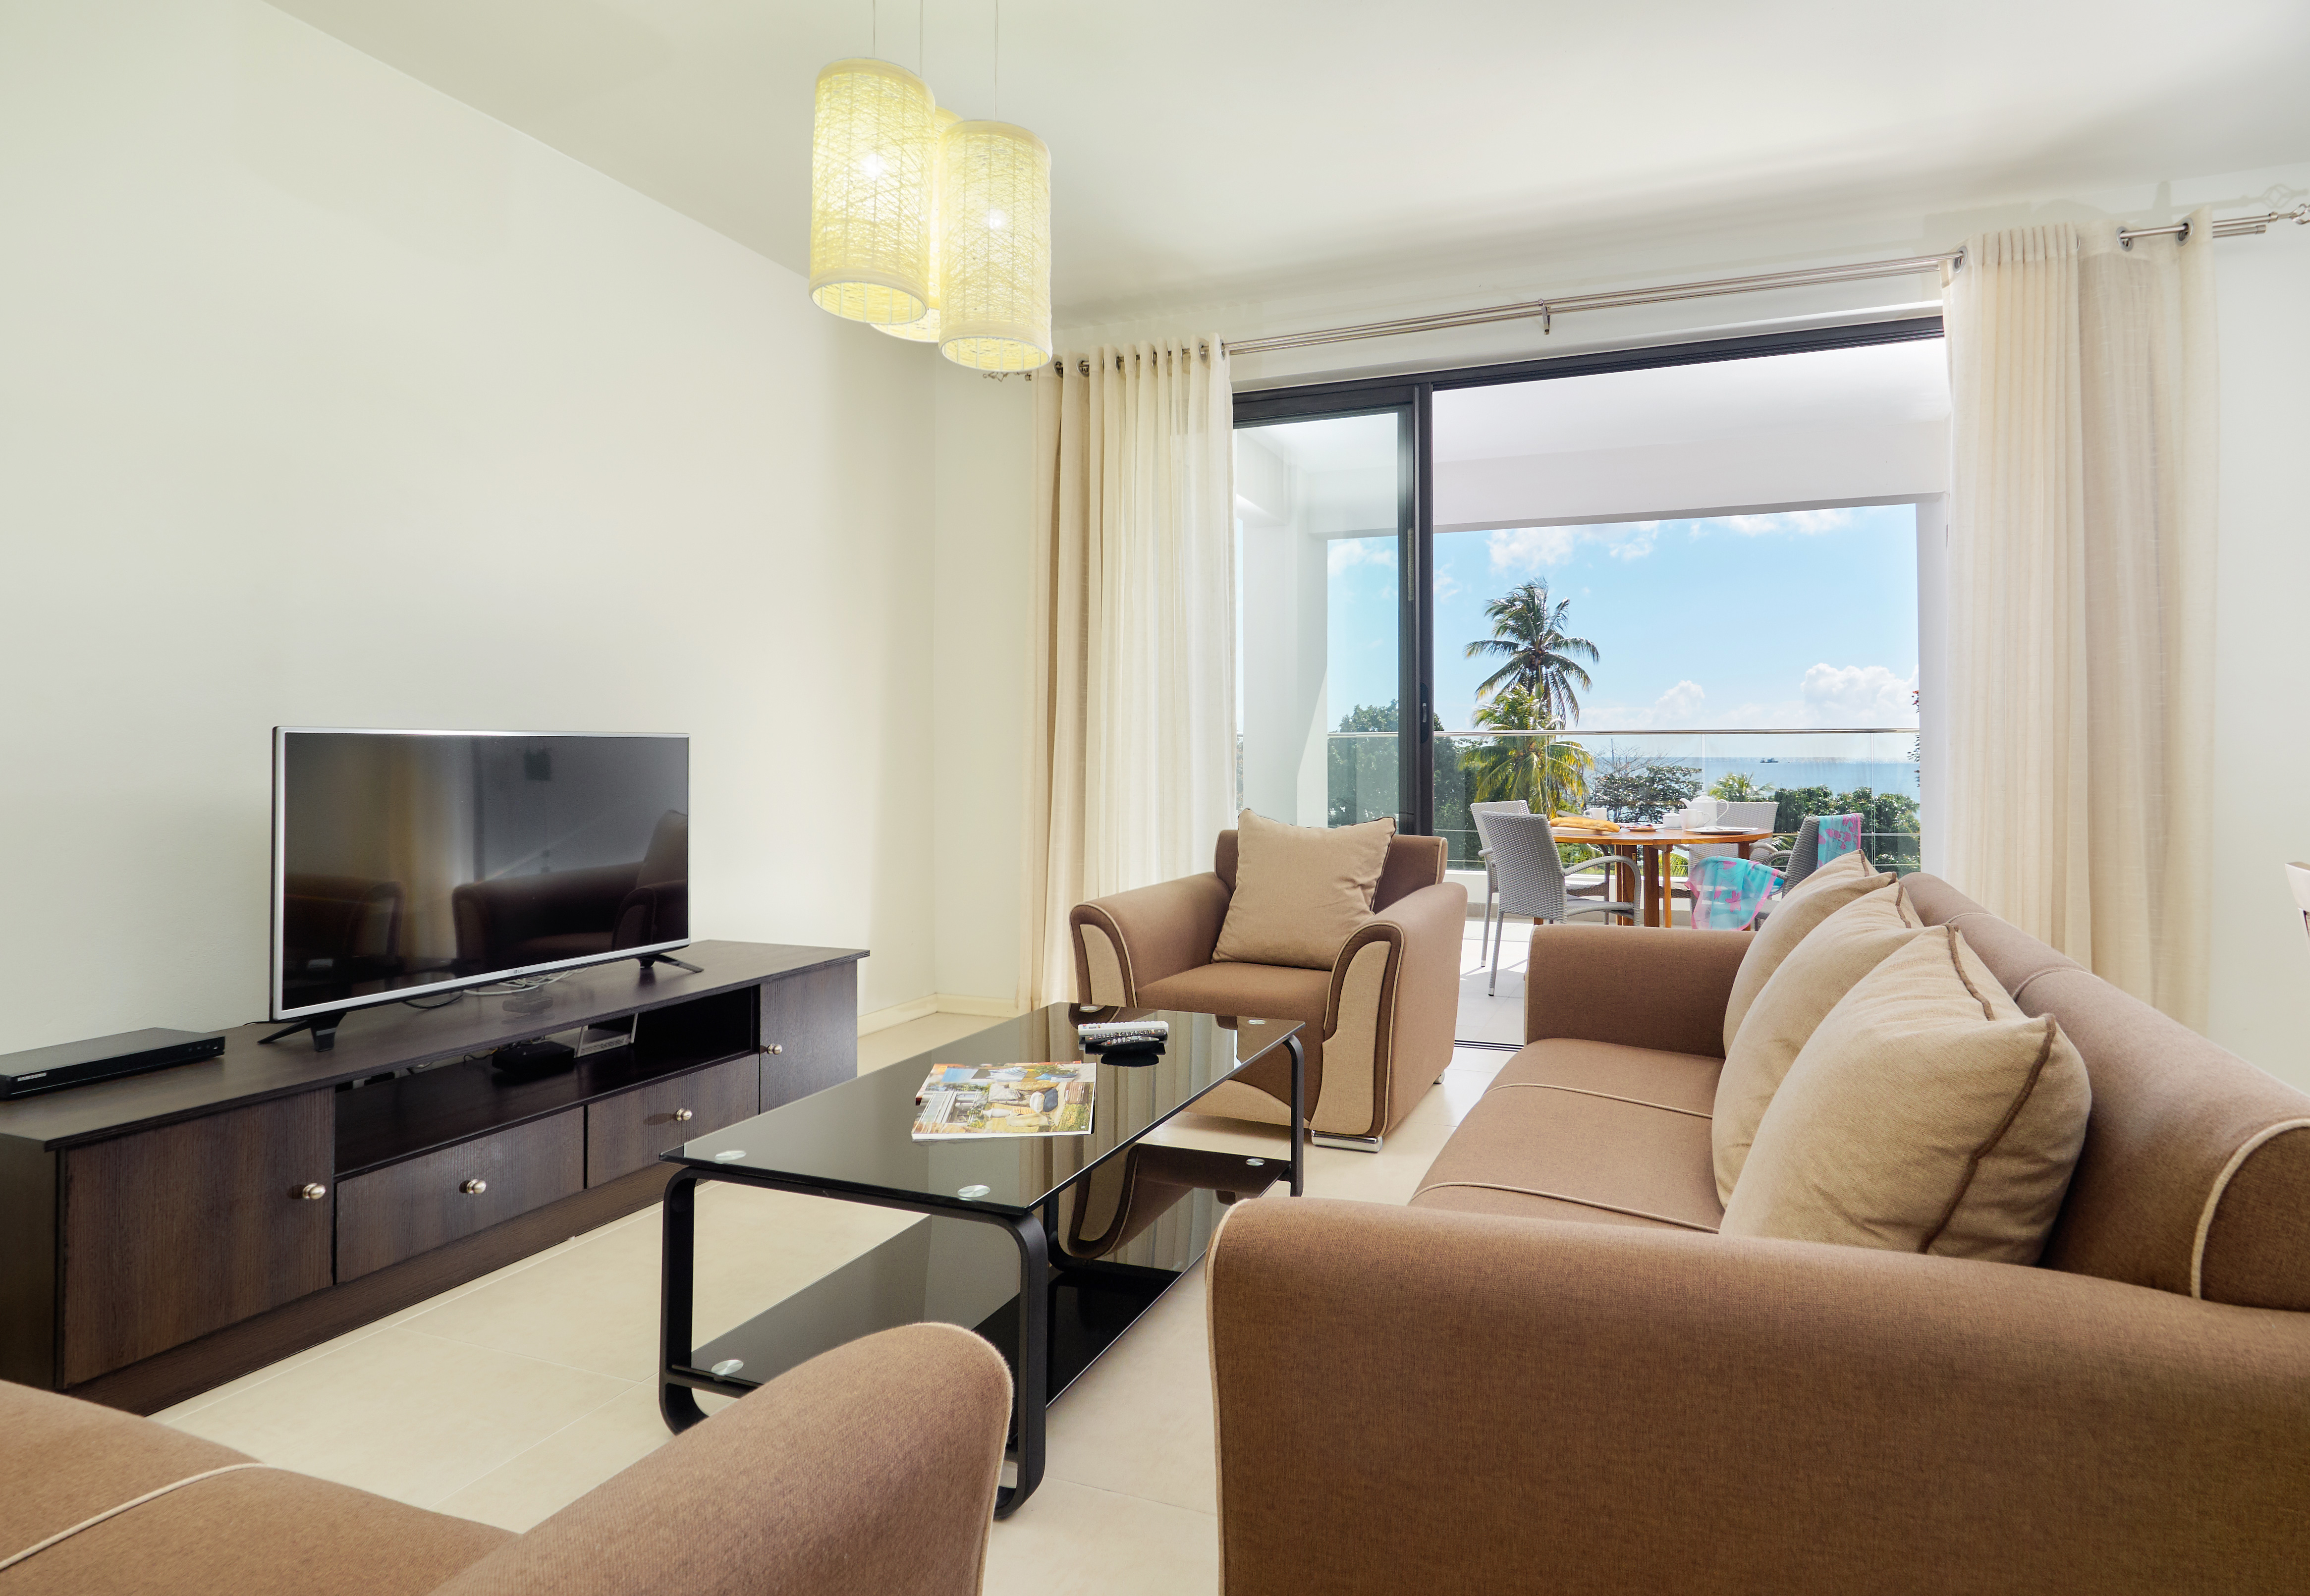 LD Apt Living Area (2)